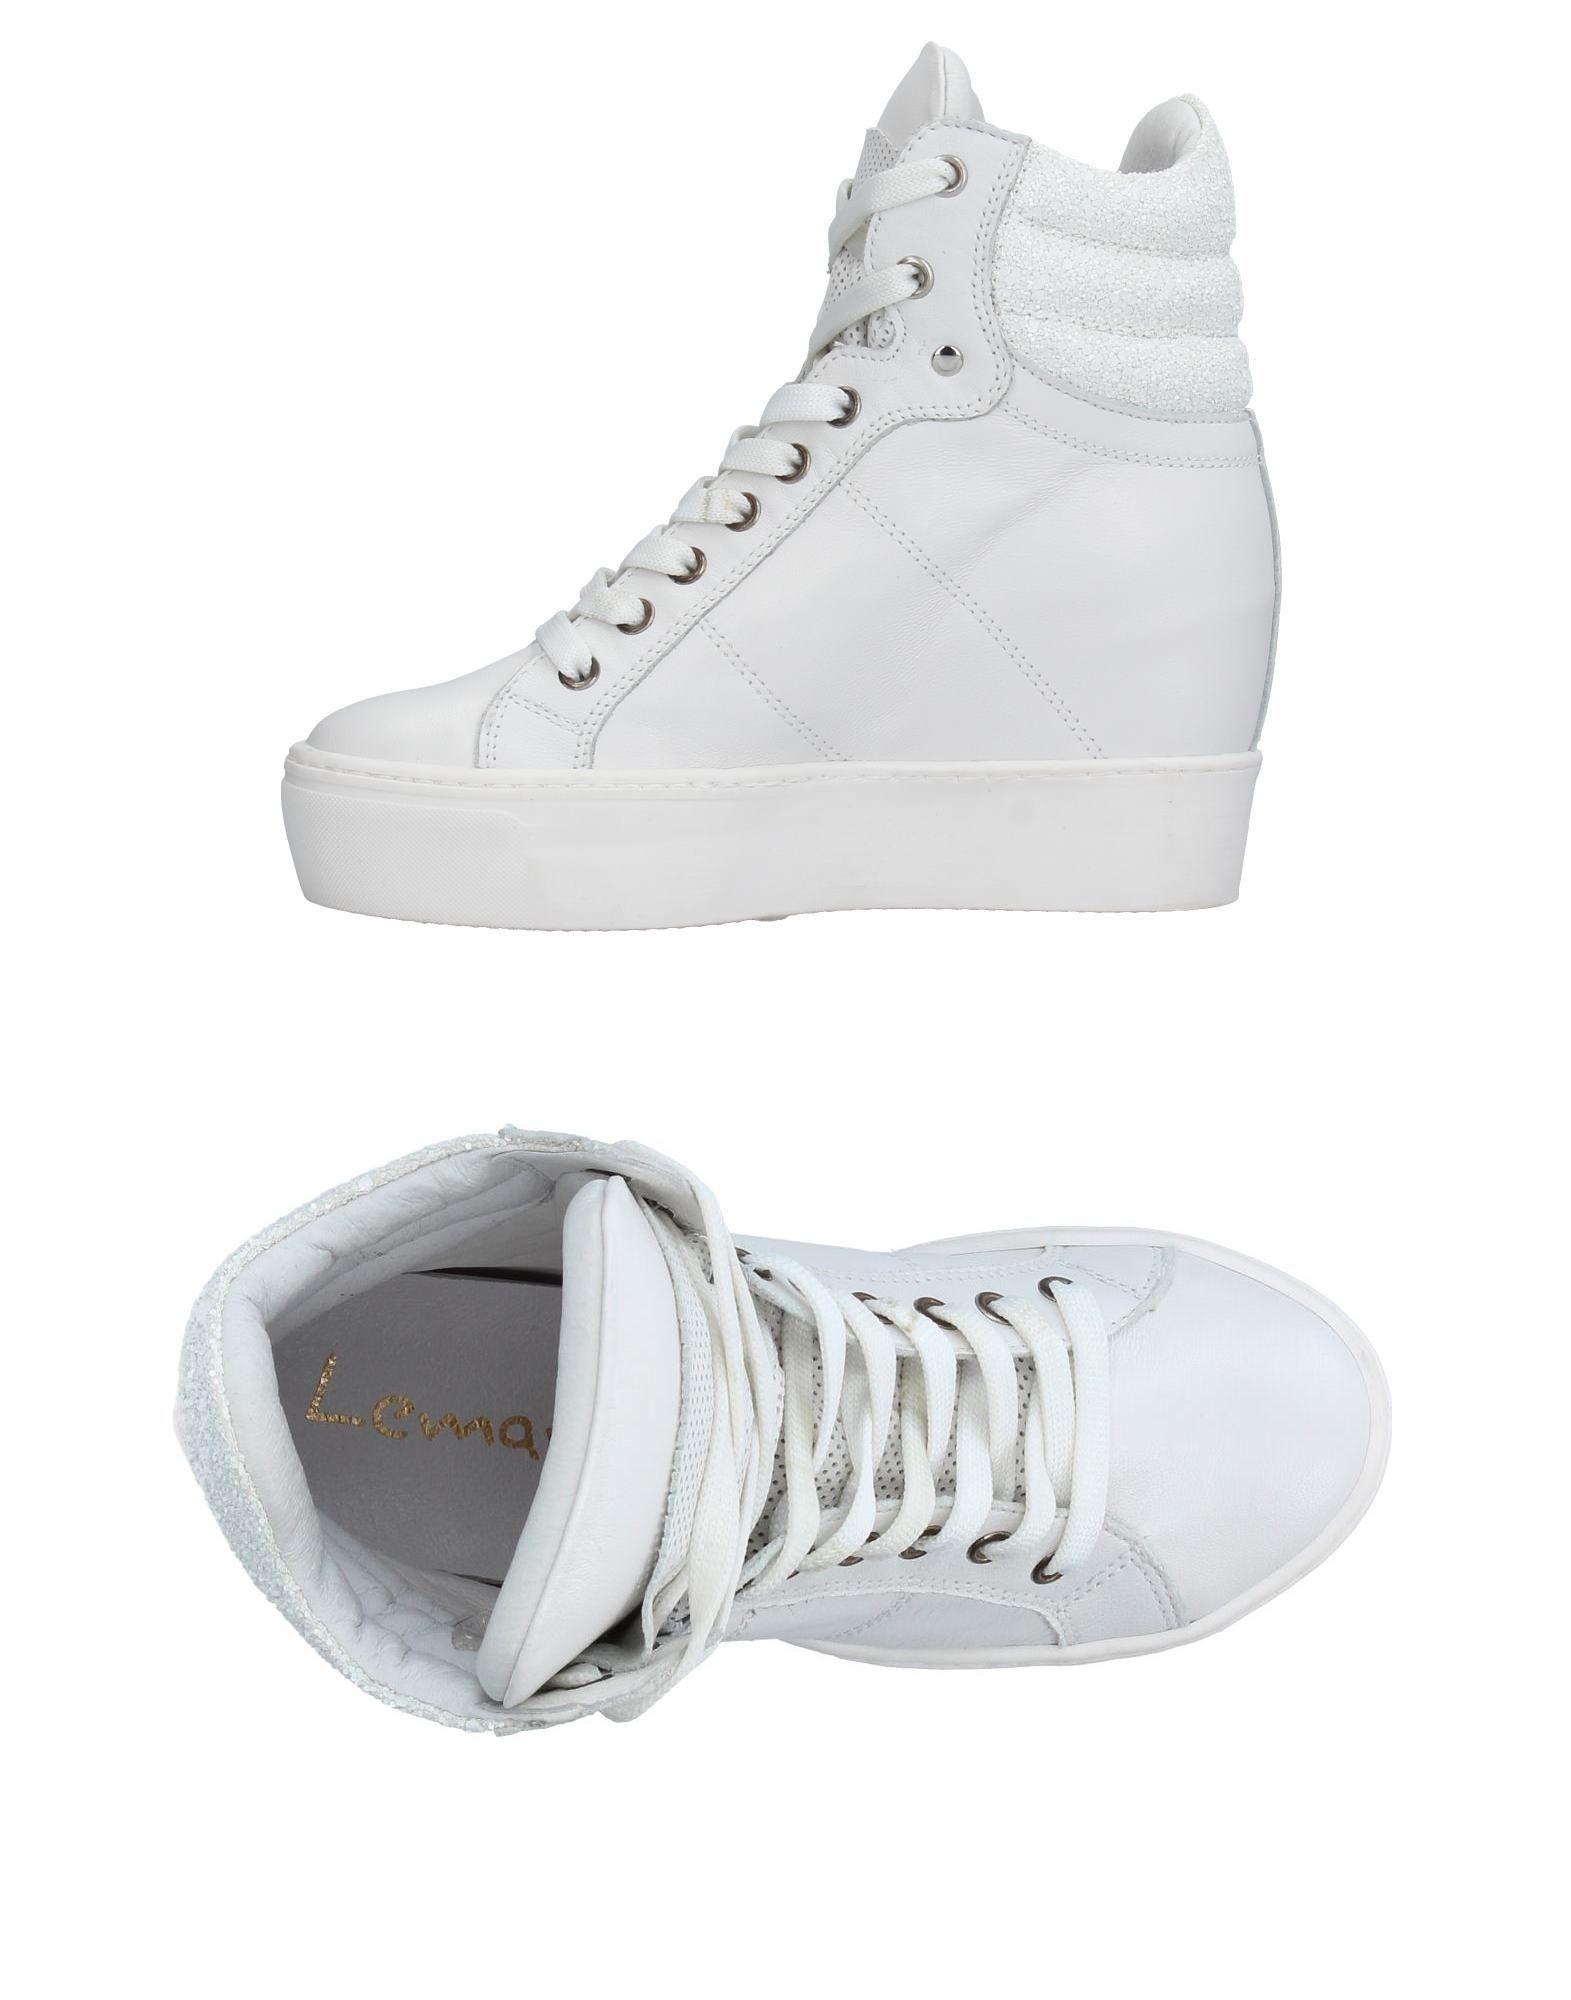 LEMARÉ Высокие кеды и кроссовки кеды кроссовки высокие dc council mid tx stone camo